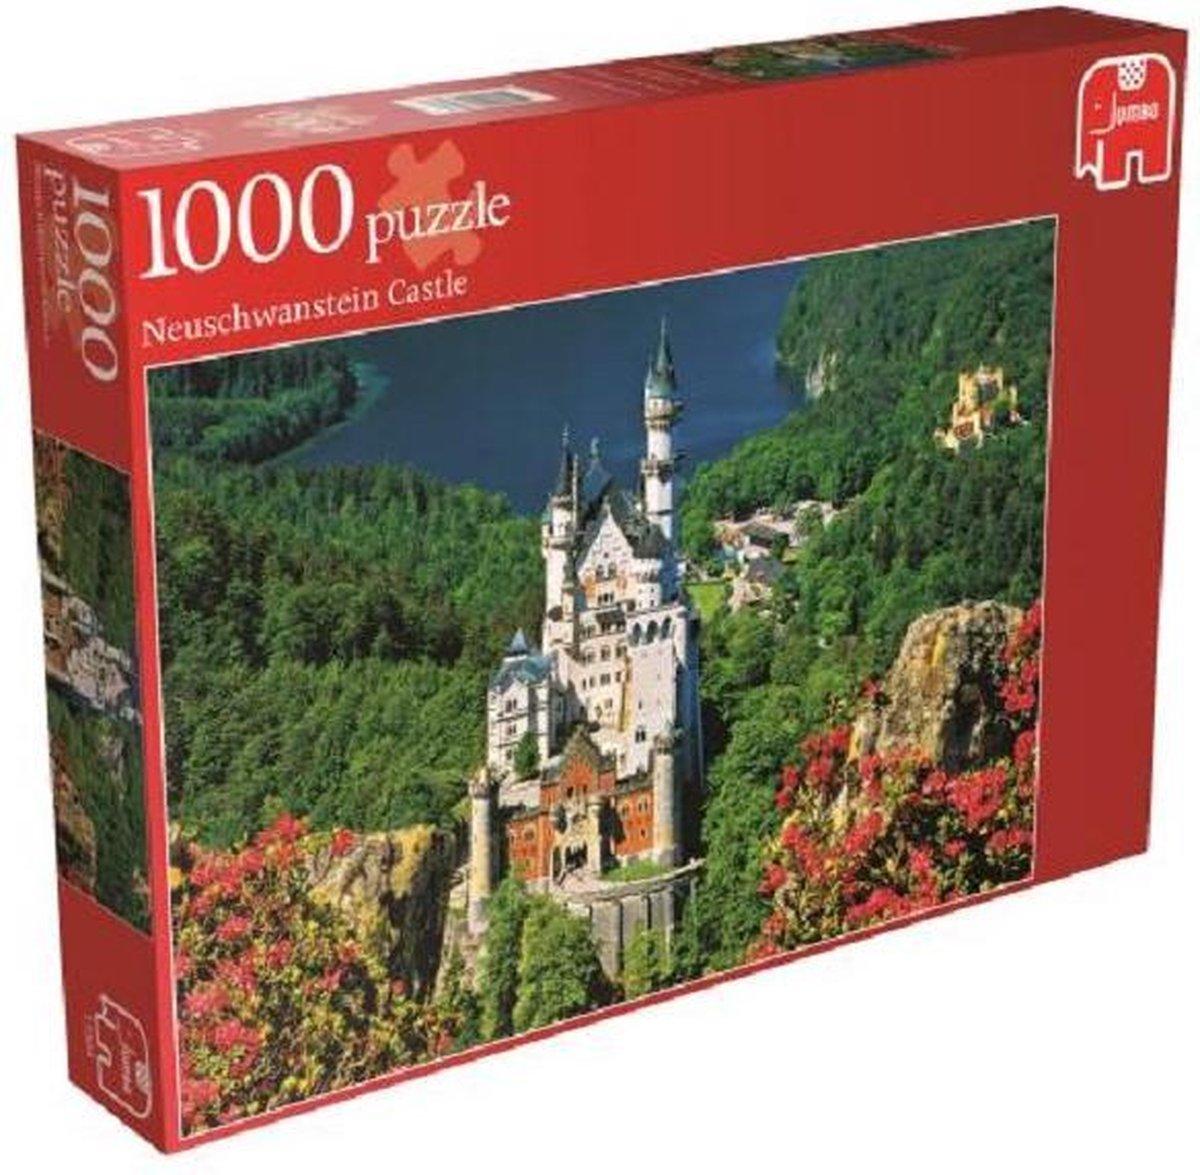 Jumbo Puzzel Neuschwanstein Castle - Legpuzzel - 1000 stukjes